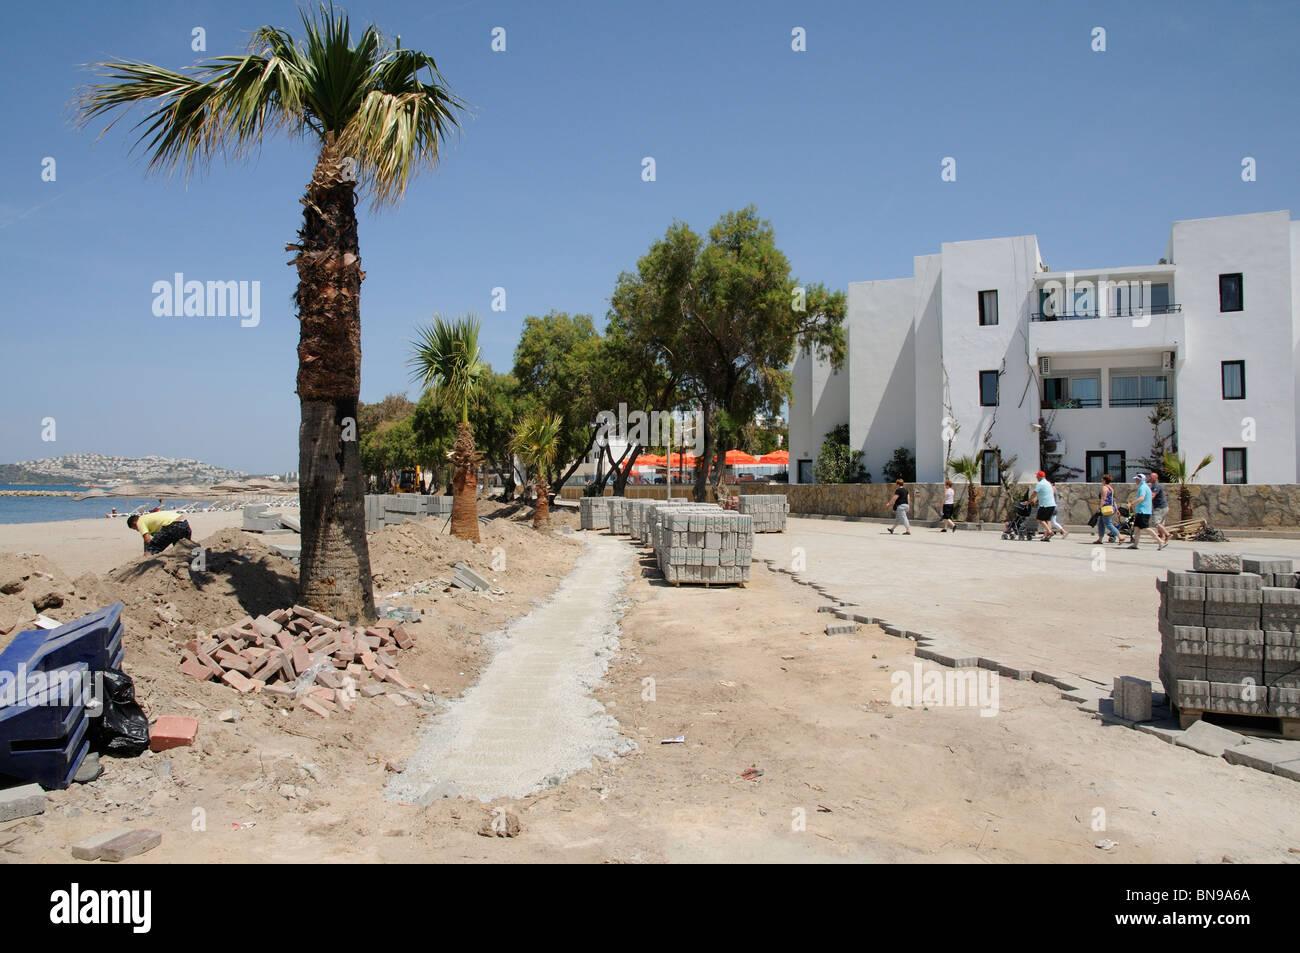 Beachfront building construction work at Turgutries Bodrum Turkey Asia Minor - Stock Image